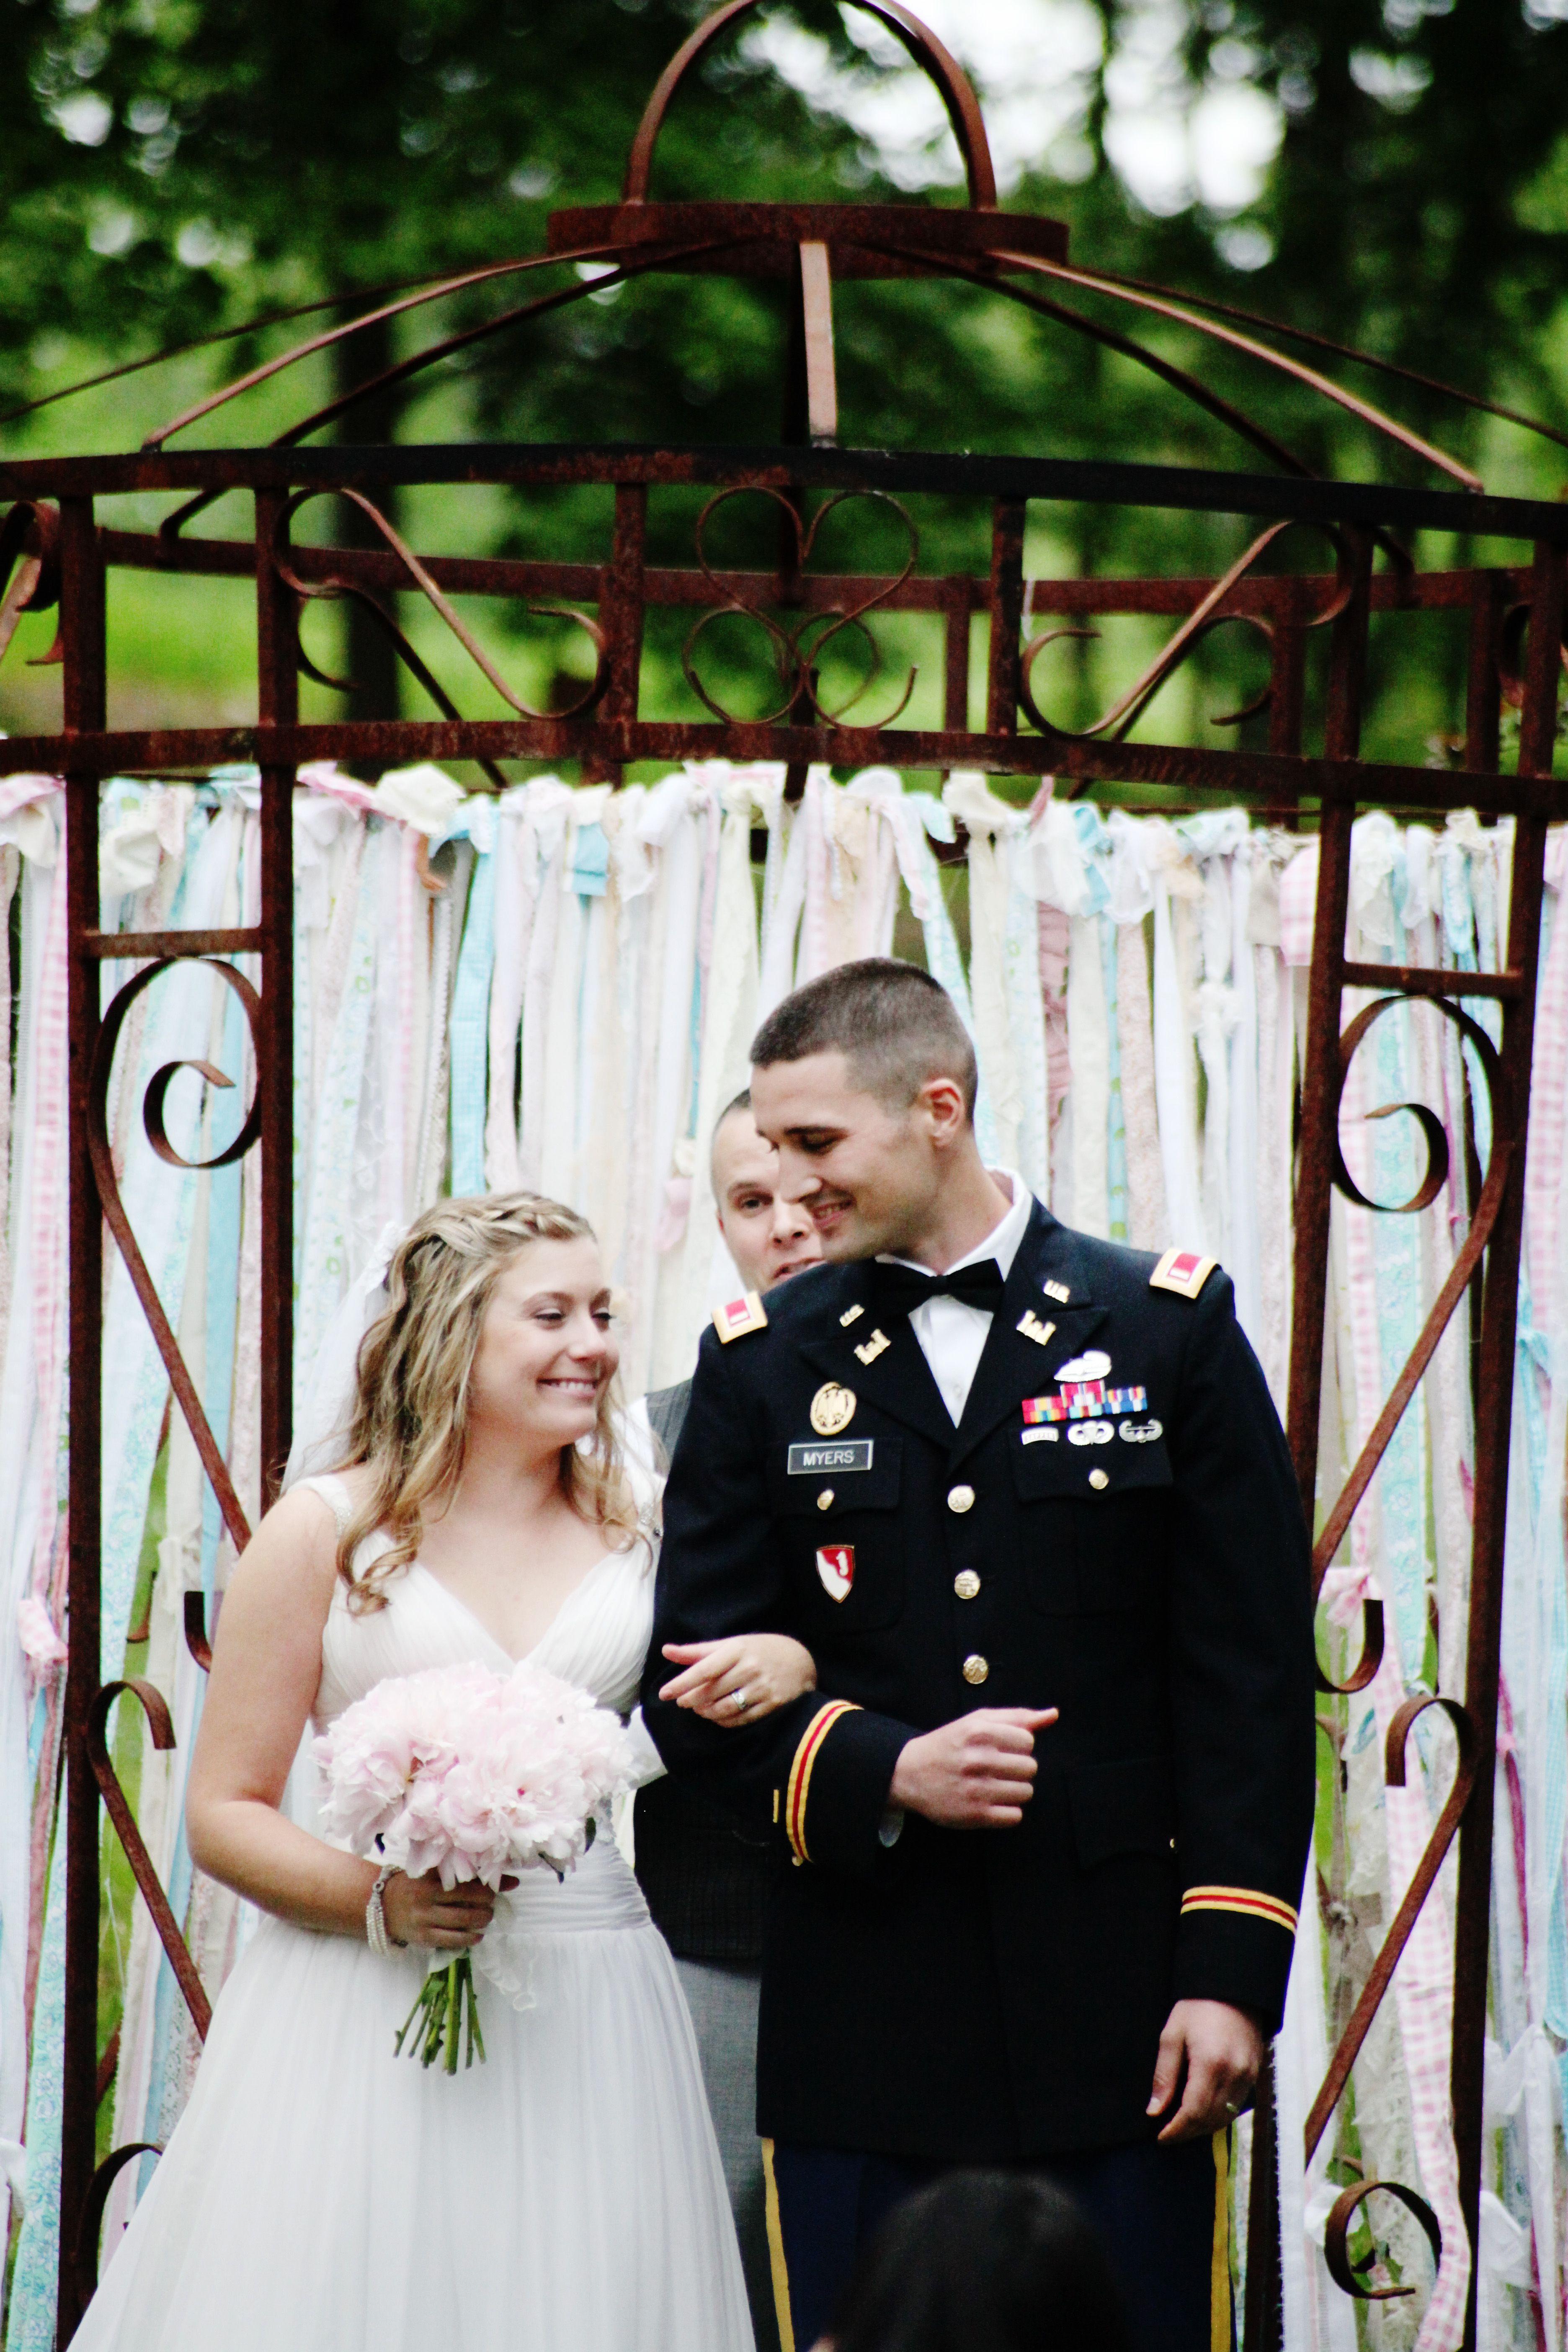 Pin By Alyssa Kostoff On Rachael Wedding Military Wedding Dresses Army Wedding Military Wedding [ 853 x 1280 Pixel ]